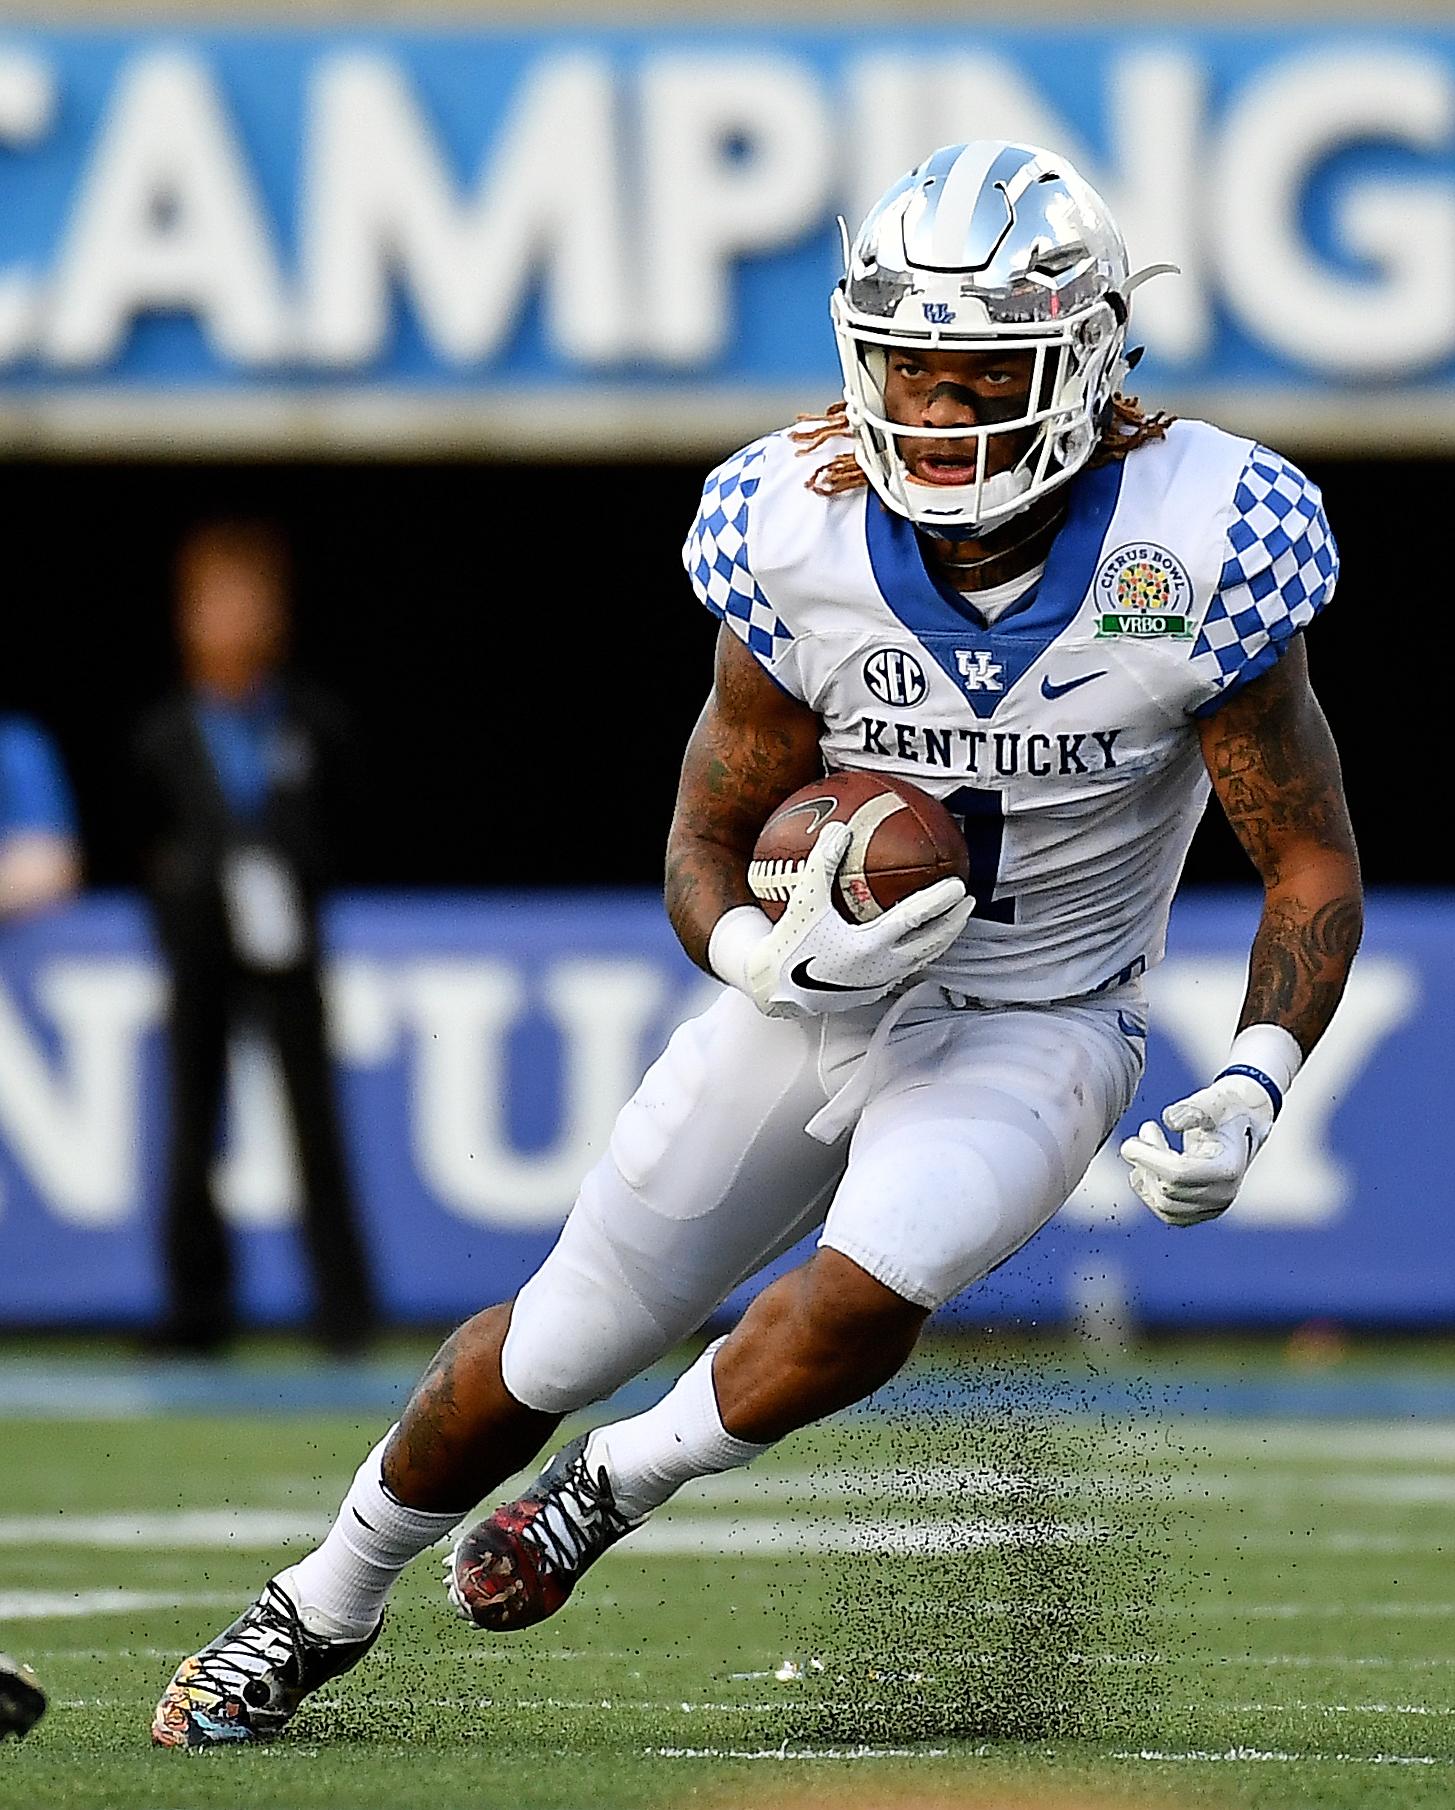 NCAA Football: Citrus Bowl-Kentucky vs Penn State